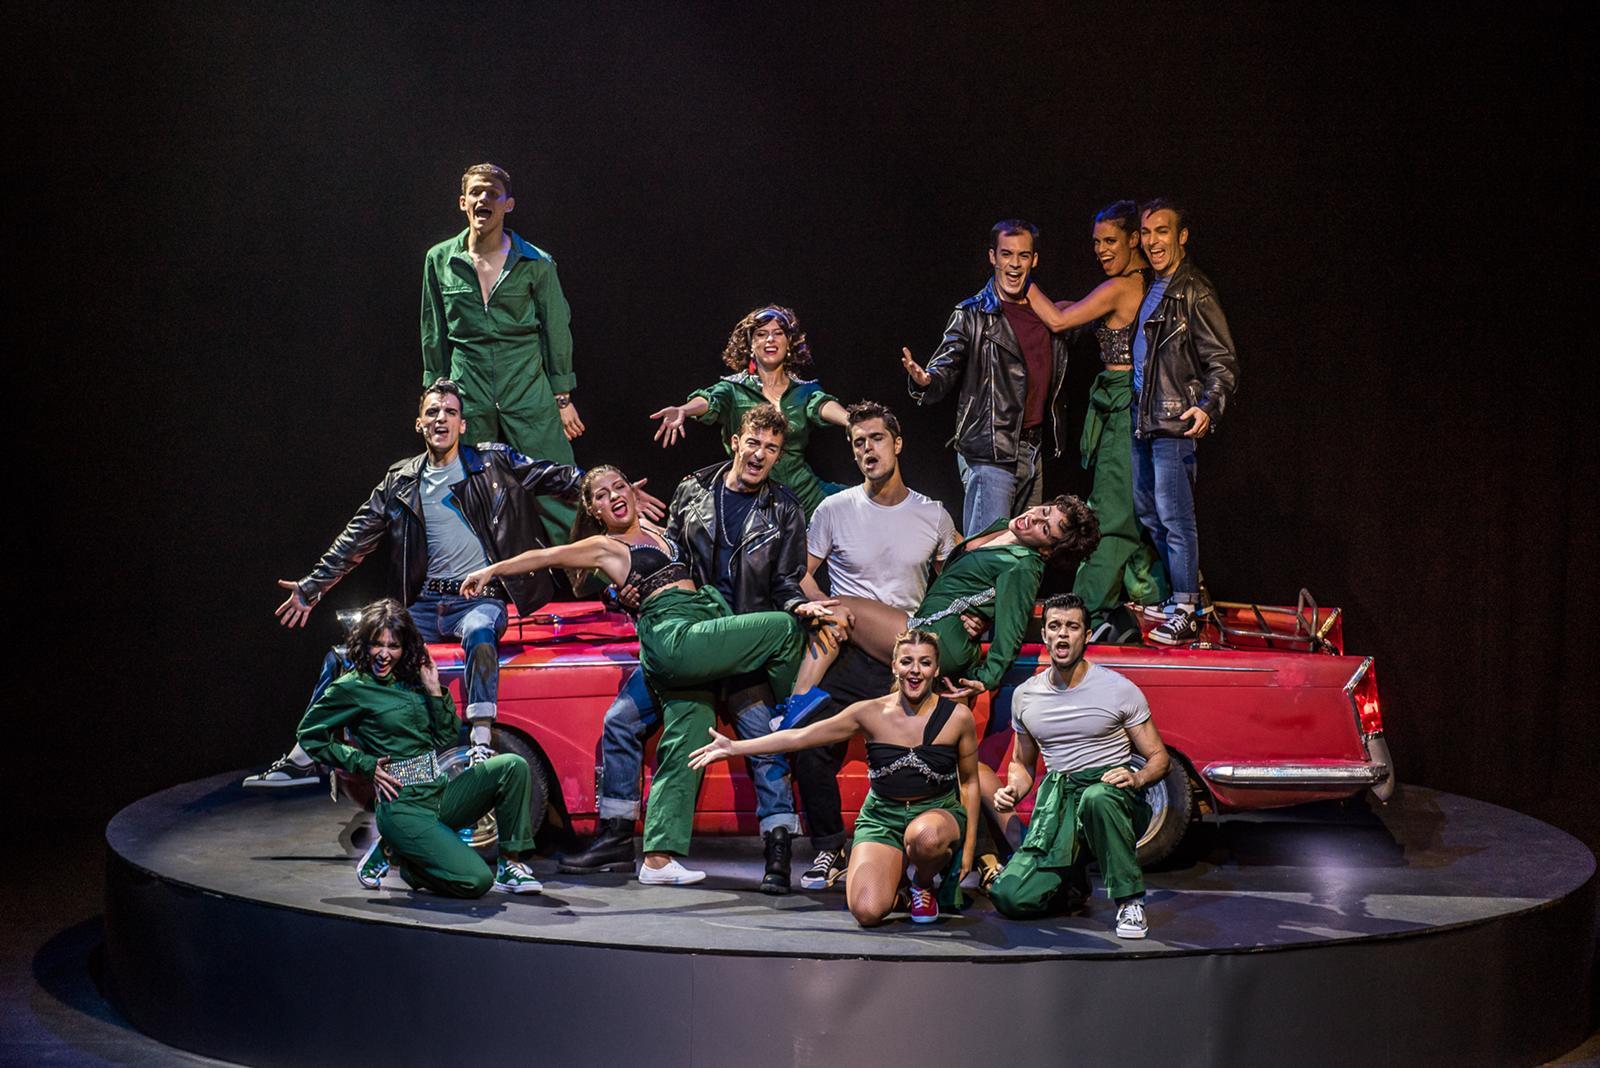 Ana Paula Rocha - Teatro - Grease - Setembro 2018 - 005